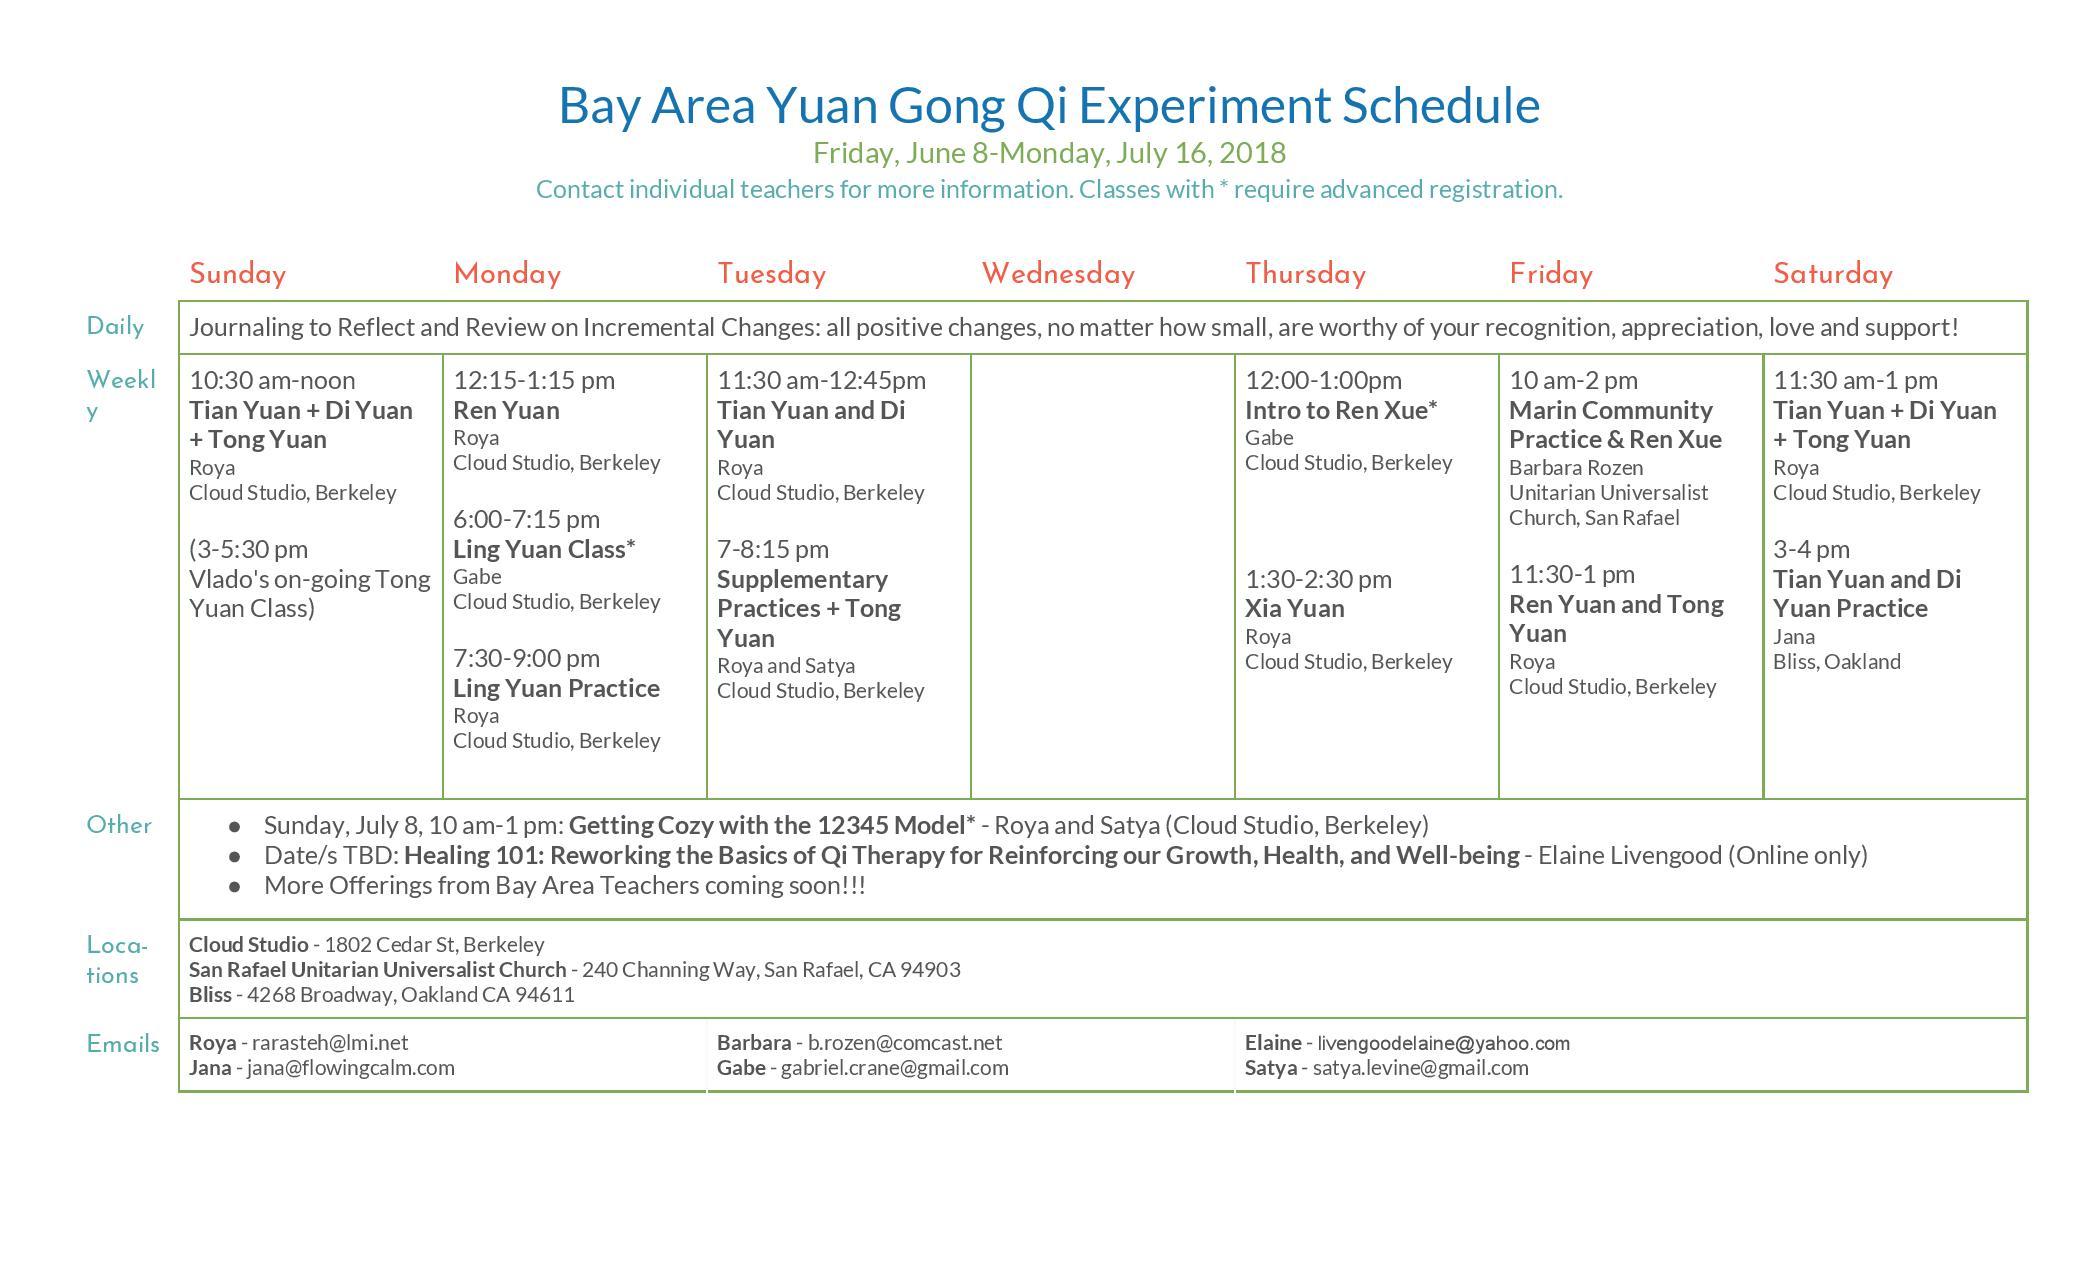 Bay Area Yuan Gong Qi Experiment Schedule-page-001.jpg